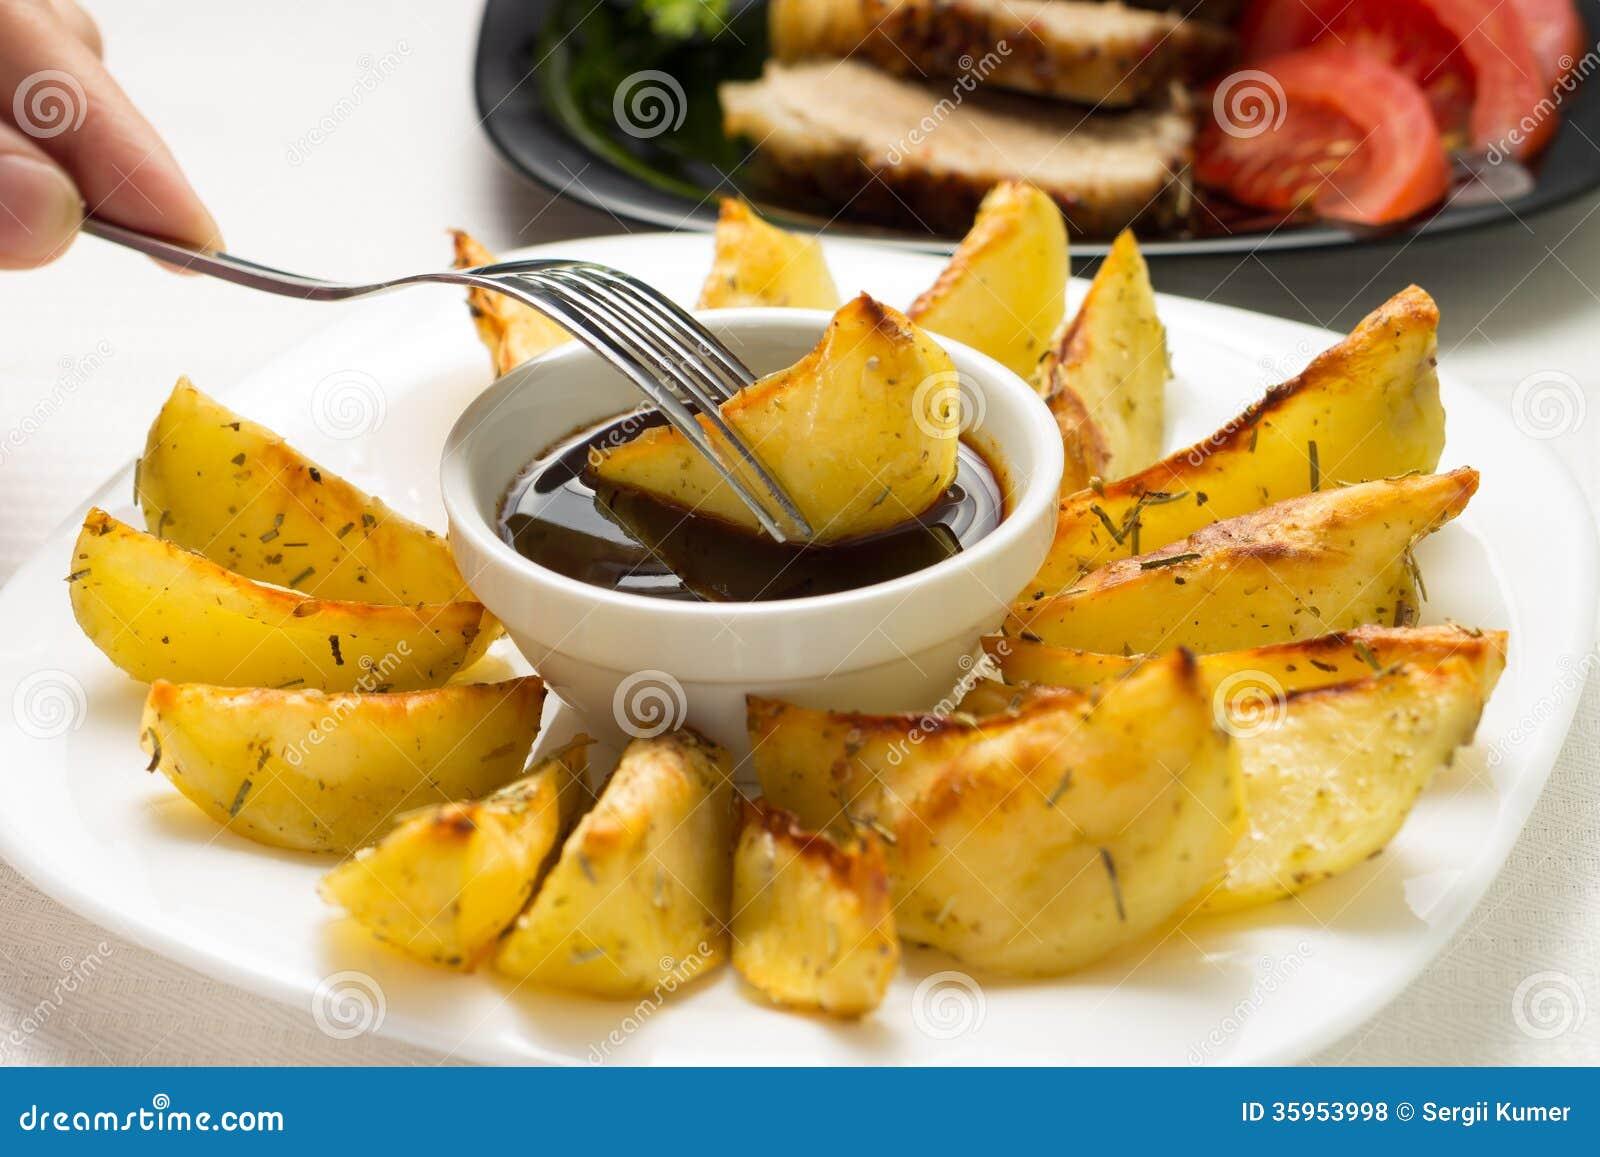 Consommation de Fried Wedge Potato